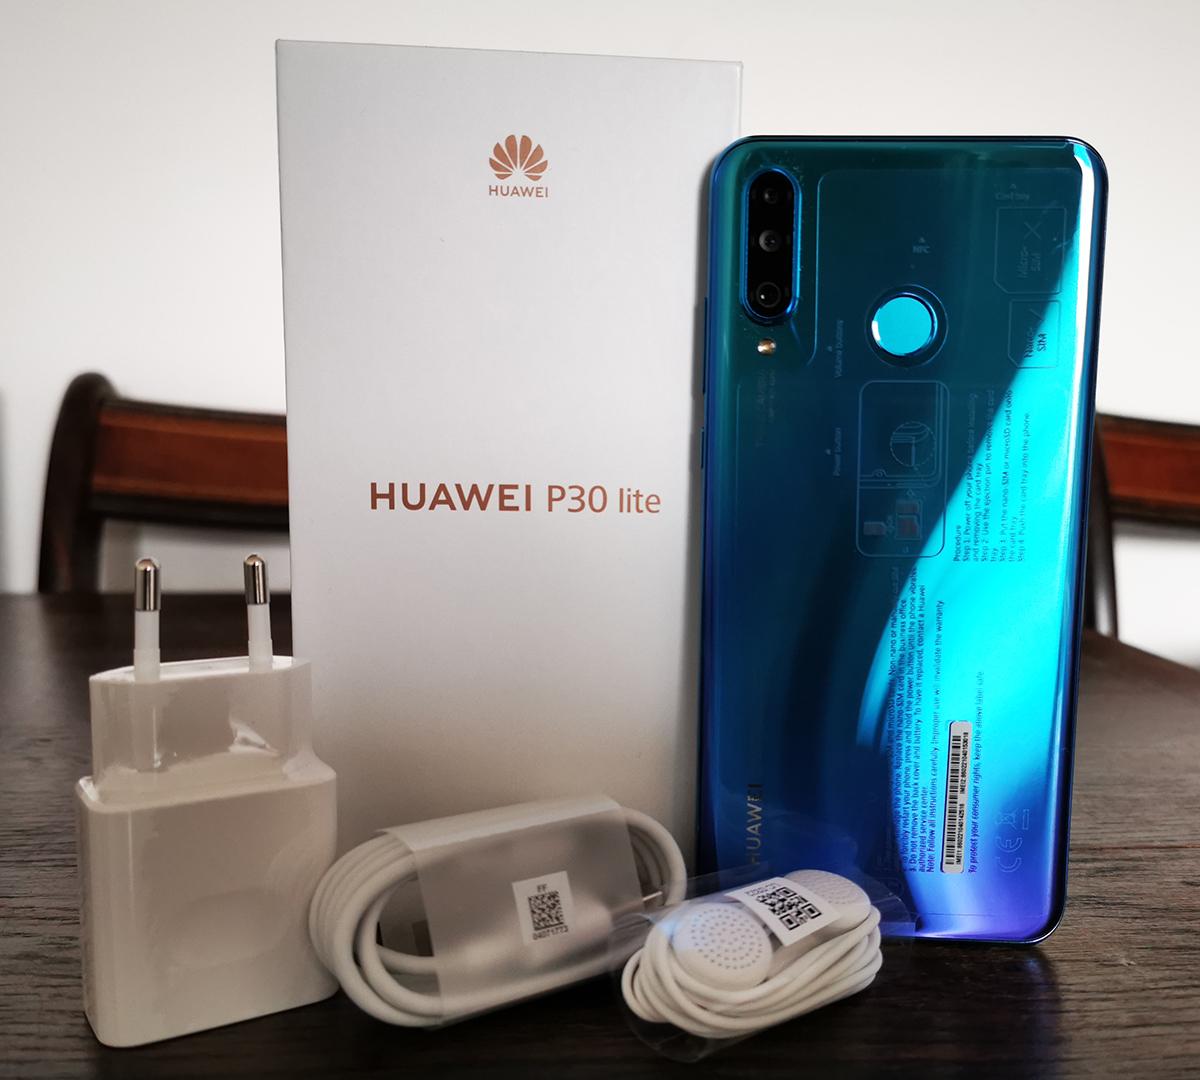 Huawei P30 lite unboxed